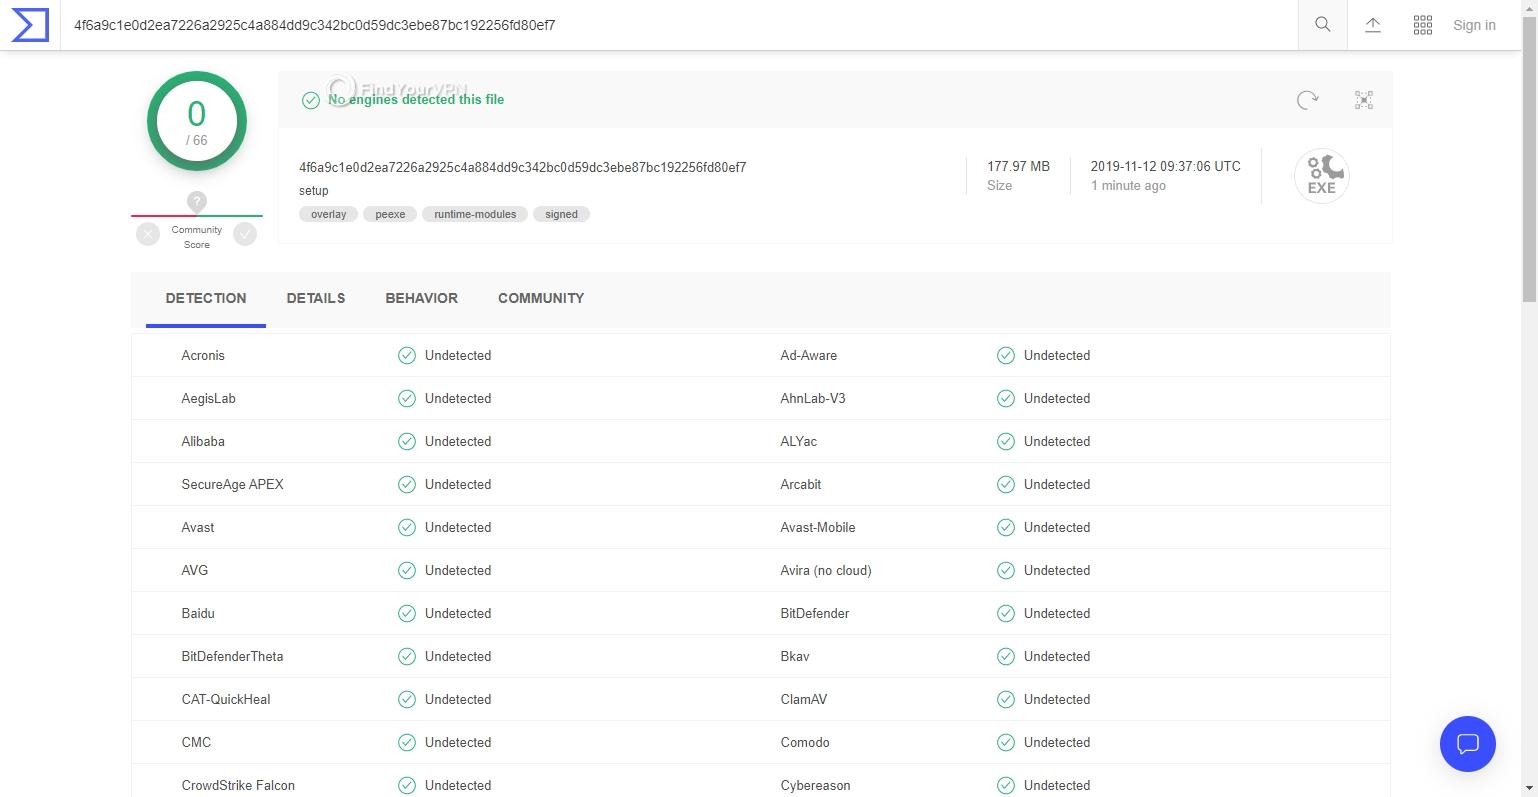 TunnelBear malware check